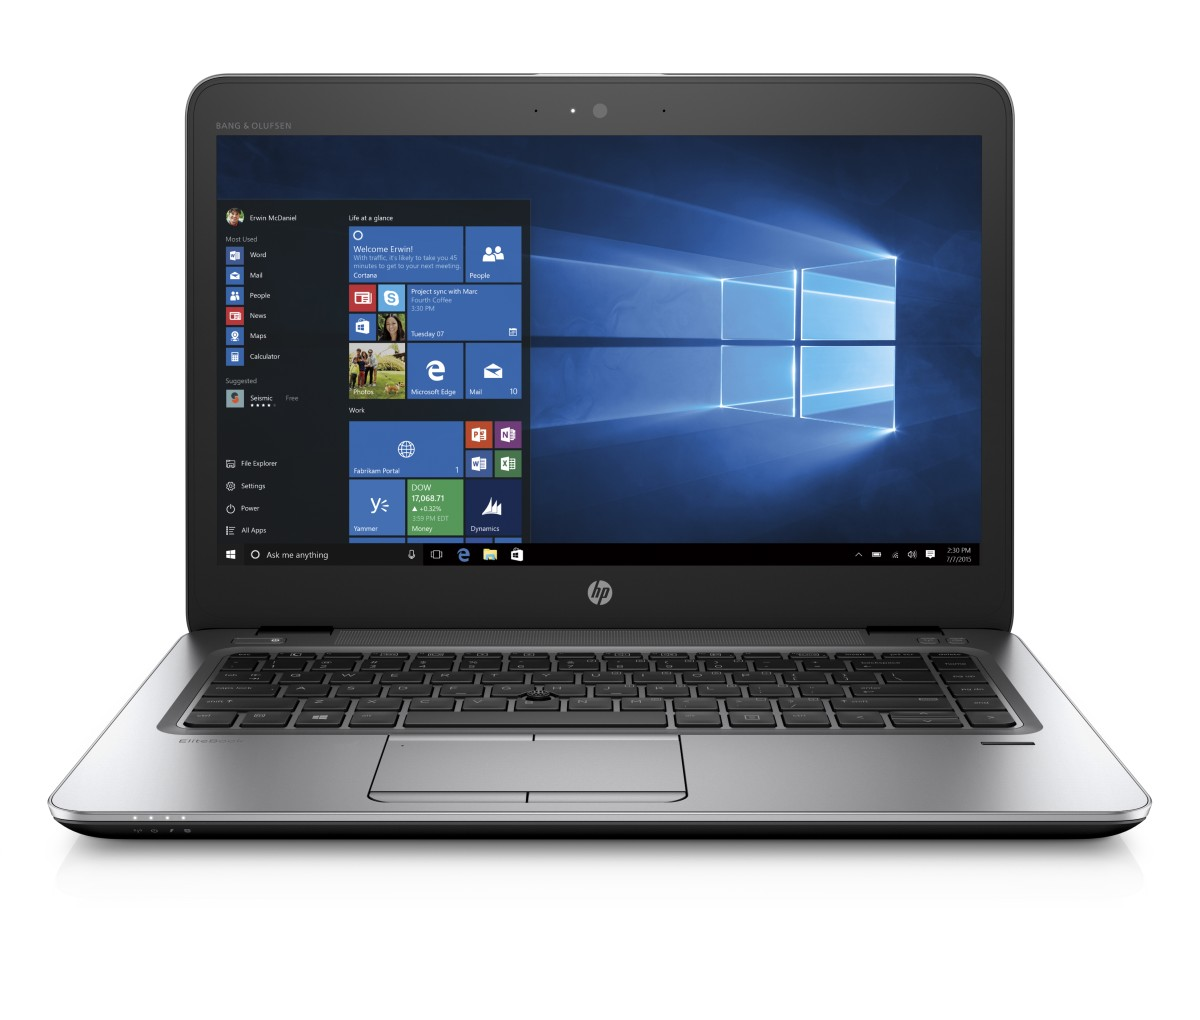 "HP EliteBook 840 G4 14"" FHD/i7-7500U/8GB/512SSD/WIFI/BT/MCR/FPR/3RServis/W10P"